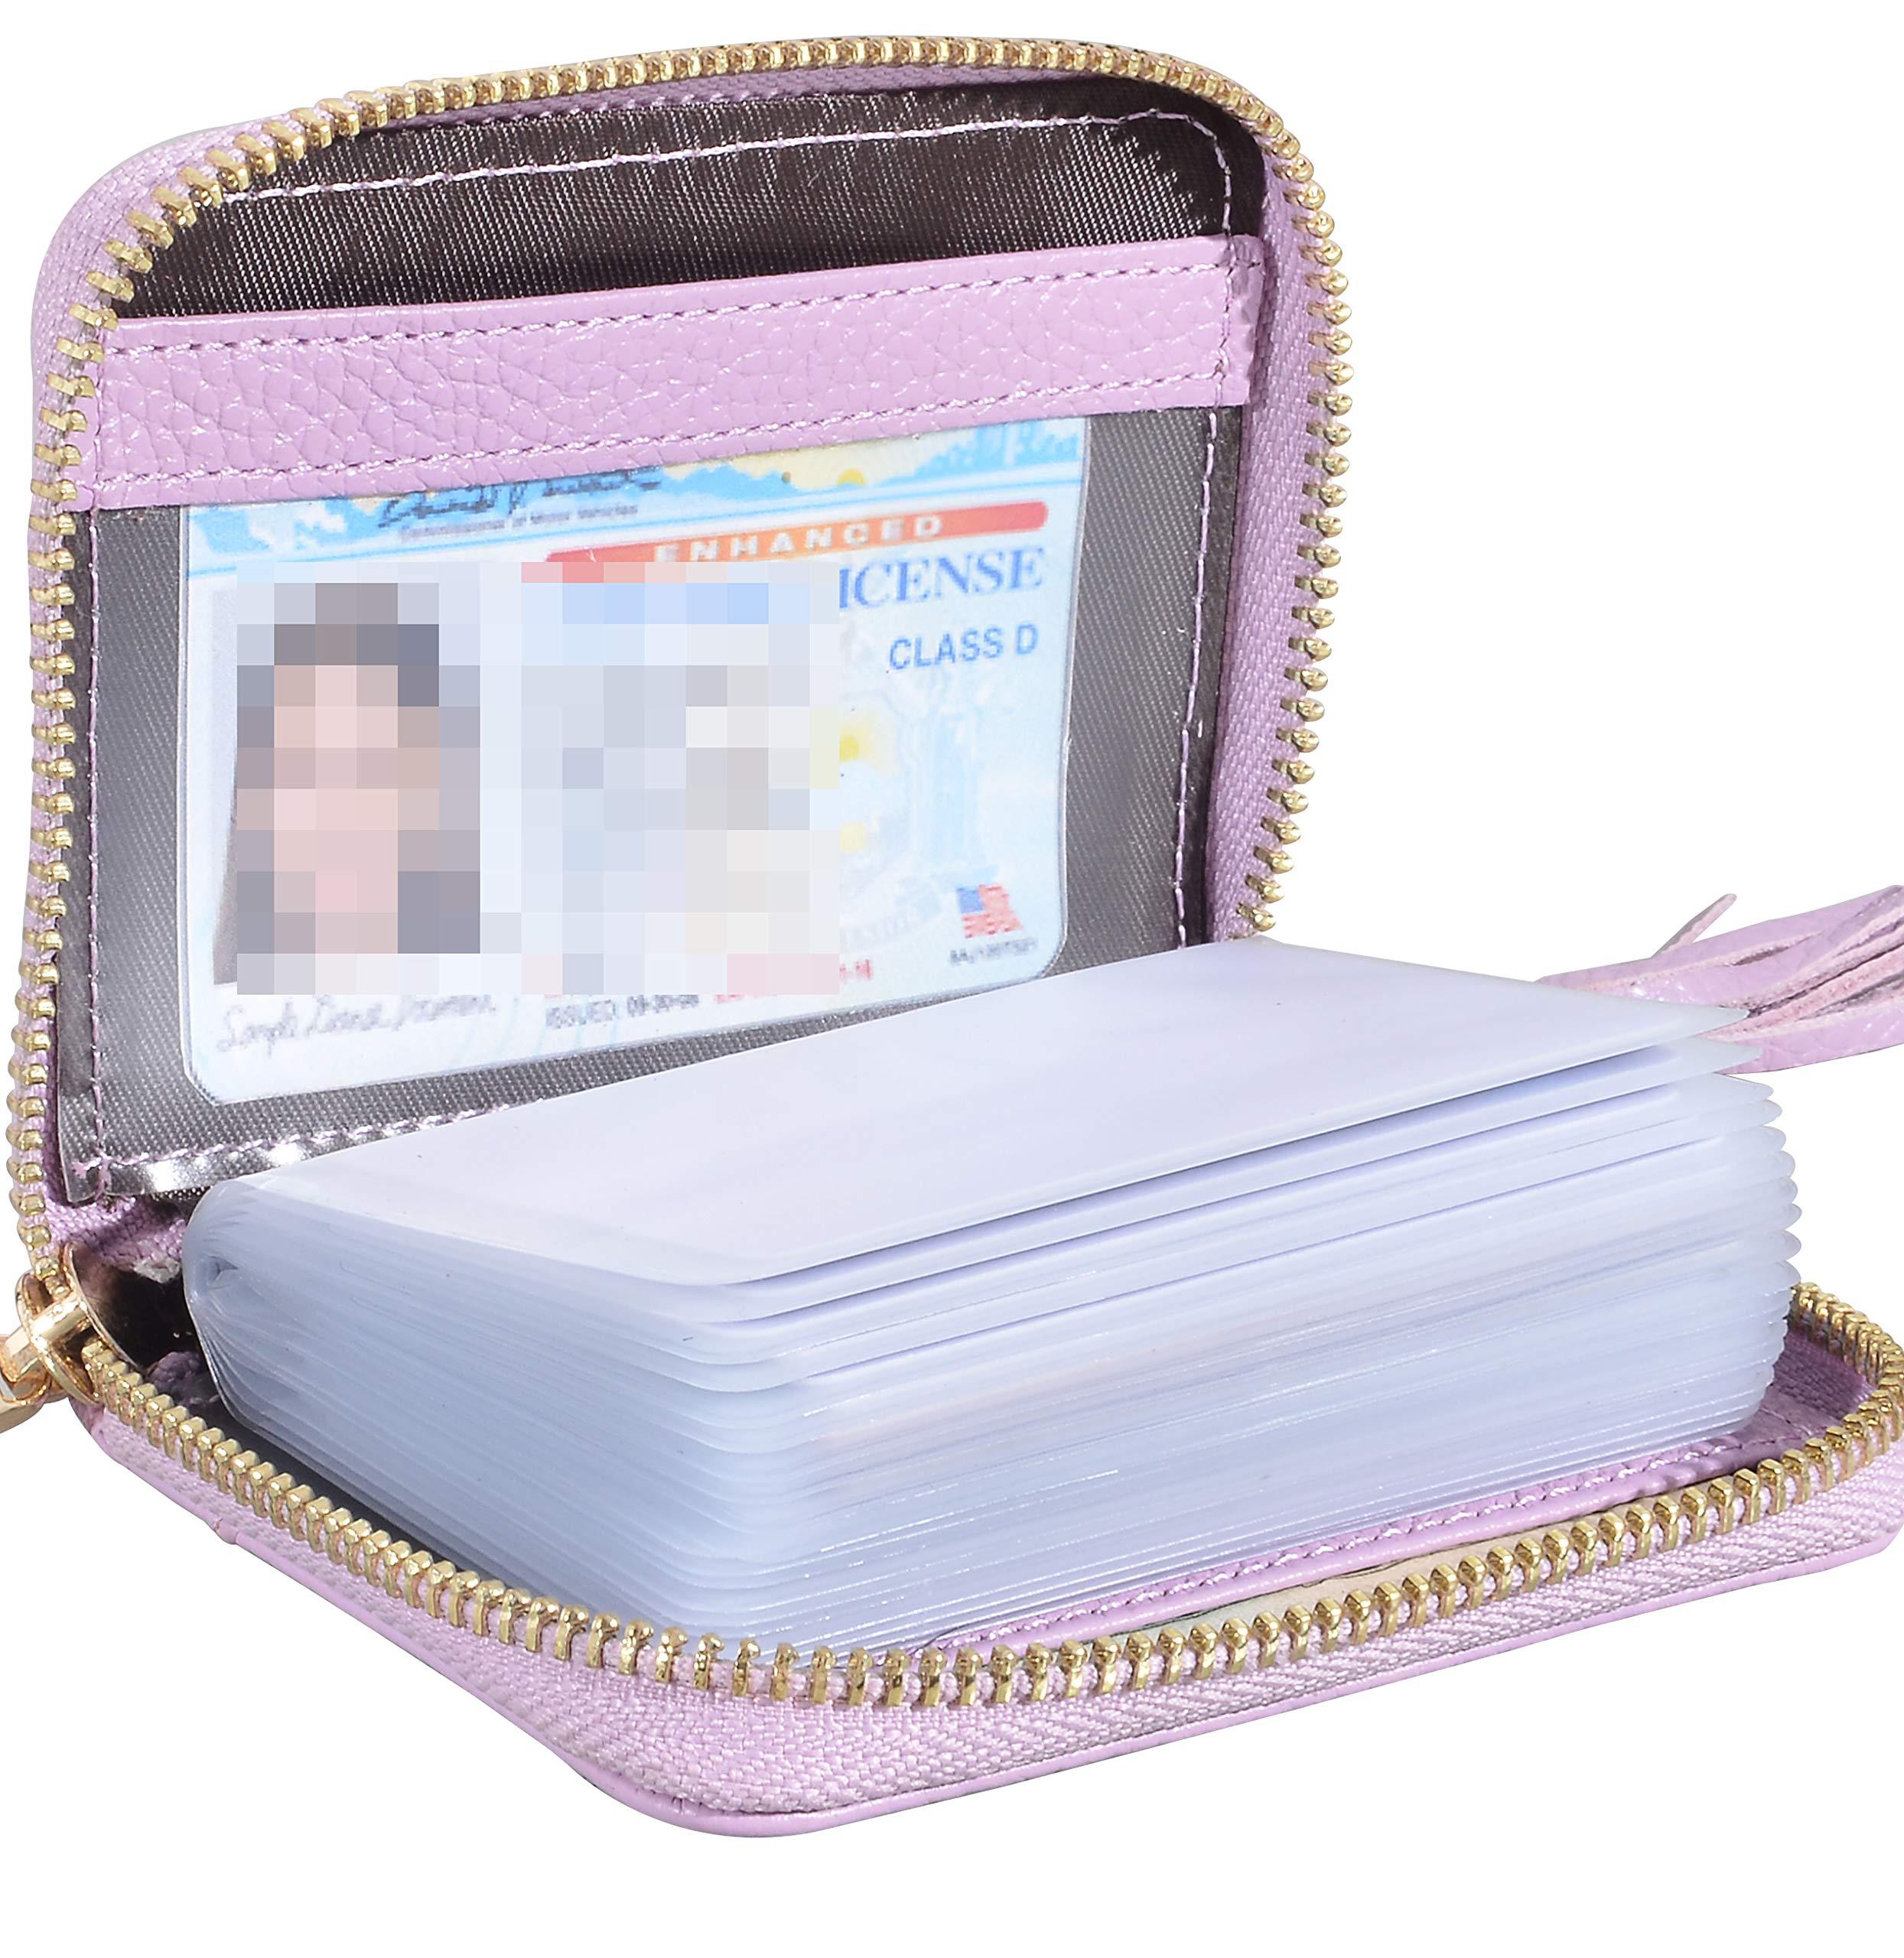 Yuhan Pretty Womens Credit Card Holder Wallet RFID Leather Small ID Card Case (lichi 20 Purple)